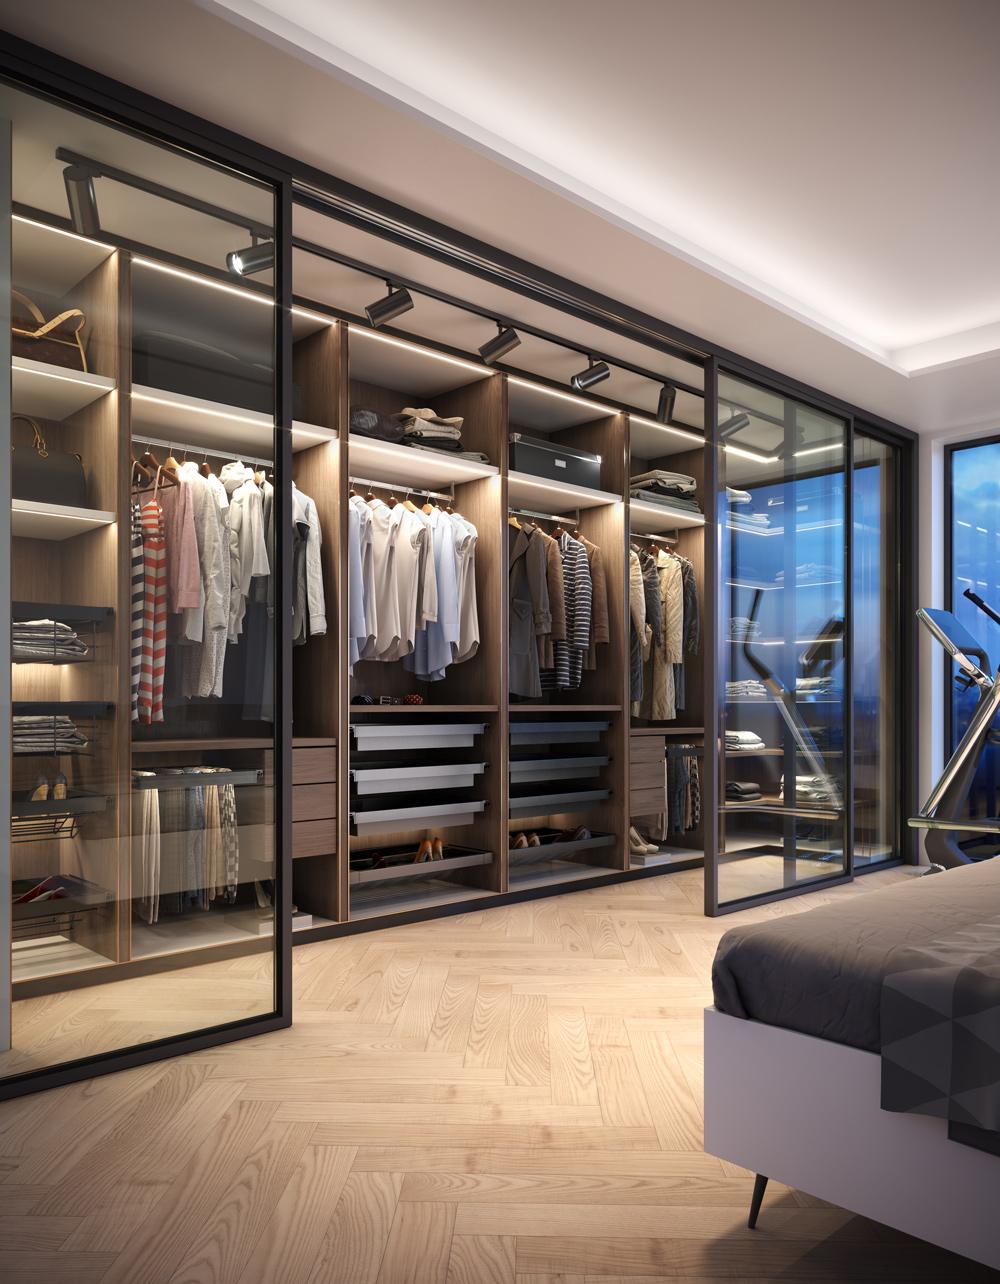 elite-wardrobe-3d-render